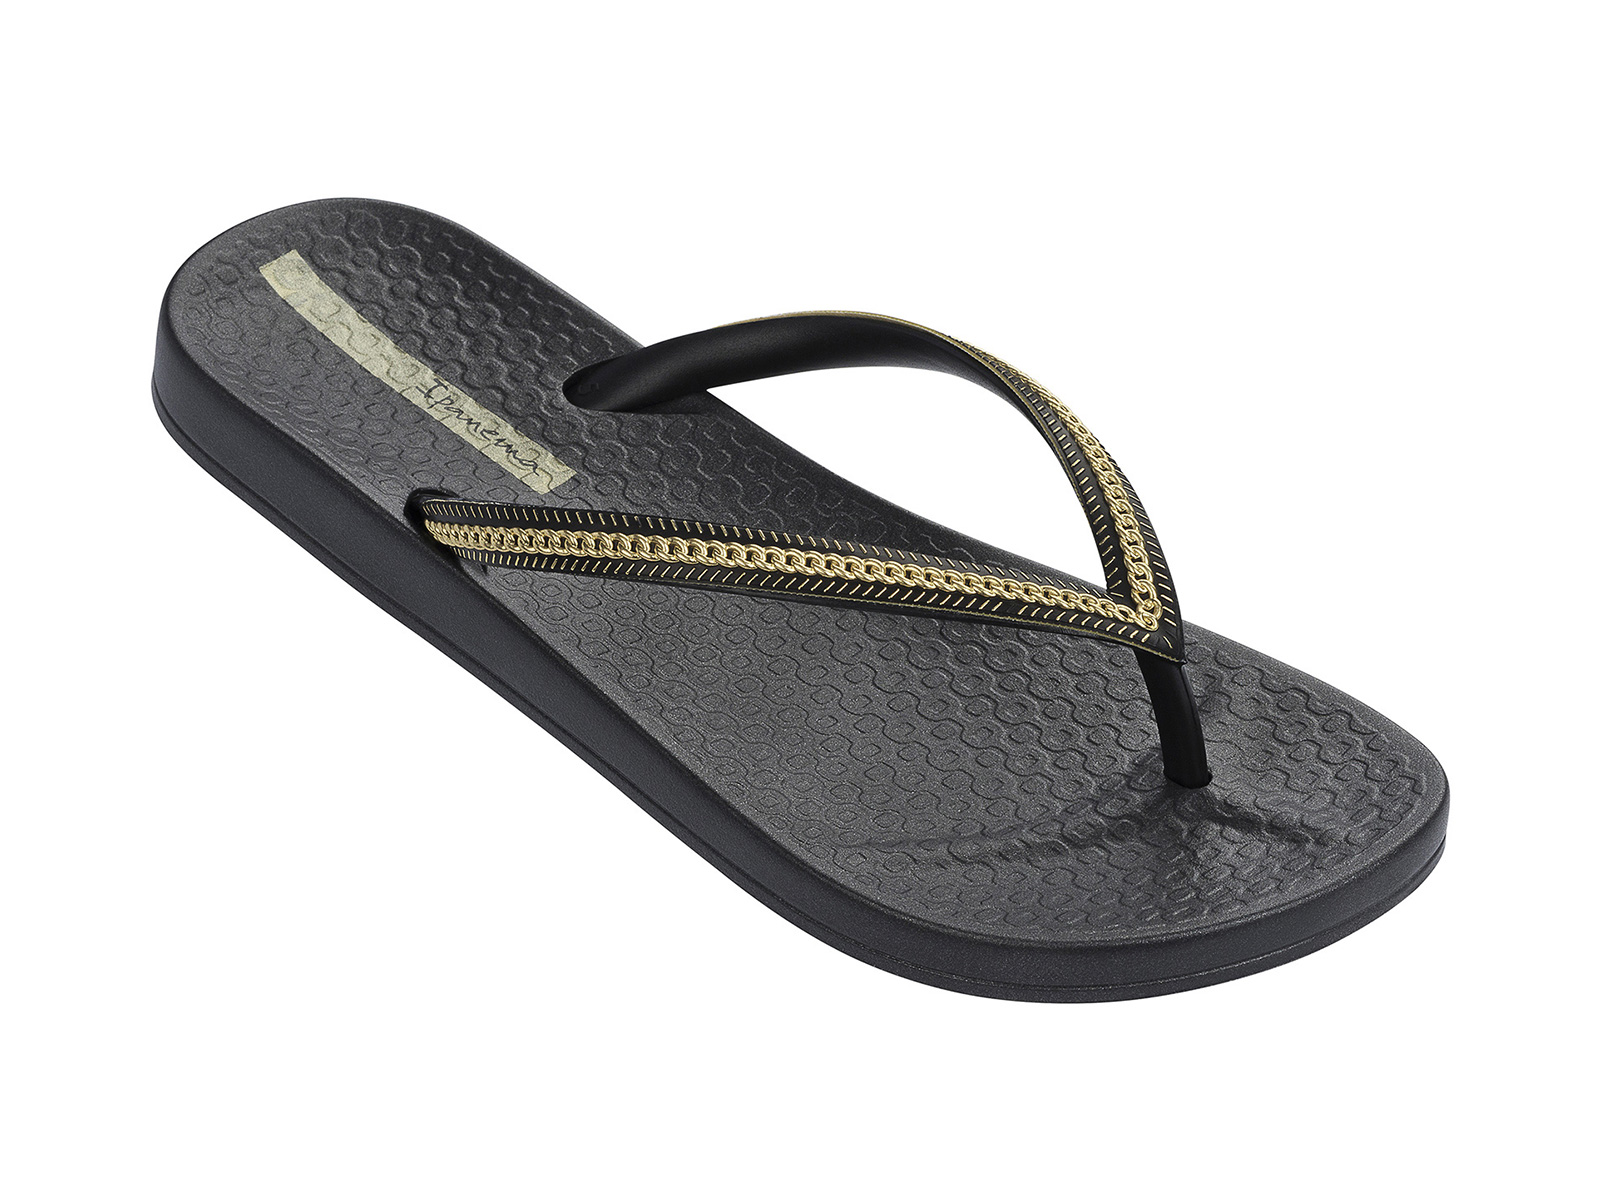 b04353ab5 Flip-Flops Ana Metallic Fem - Black - Gold - Brand Ipanema